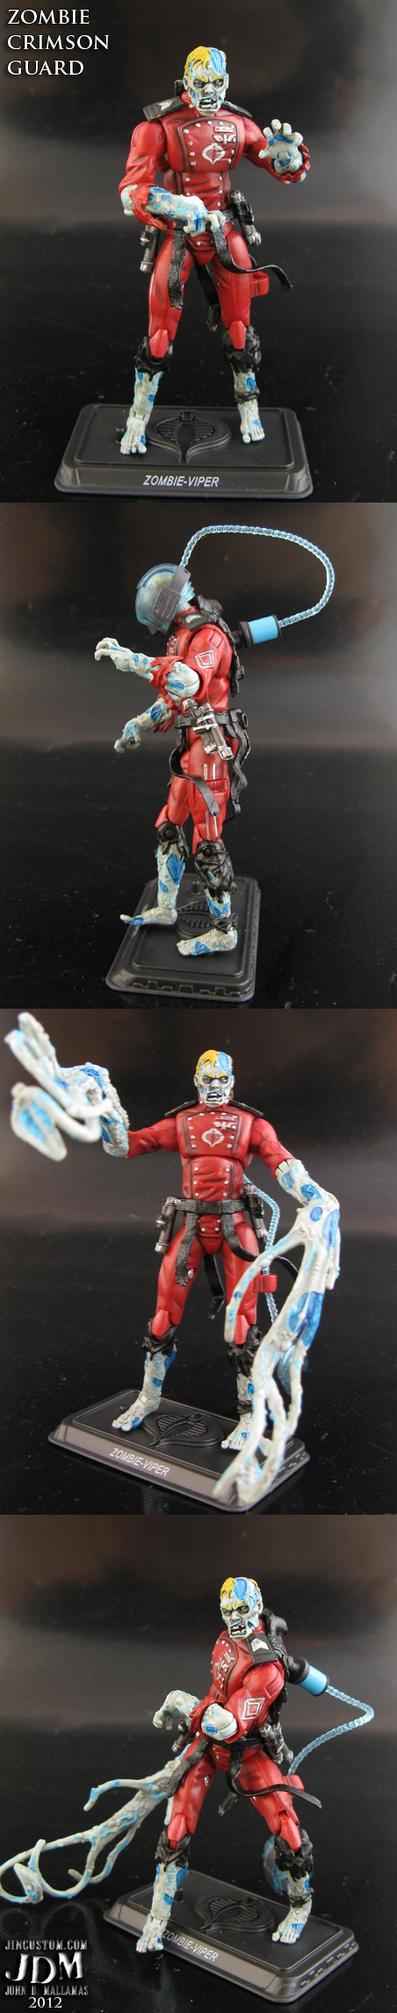 Cobra Zombie Crimson Guard by Jin-Saotome